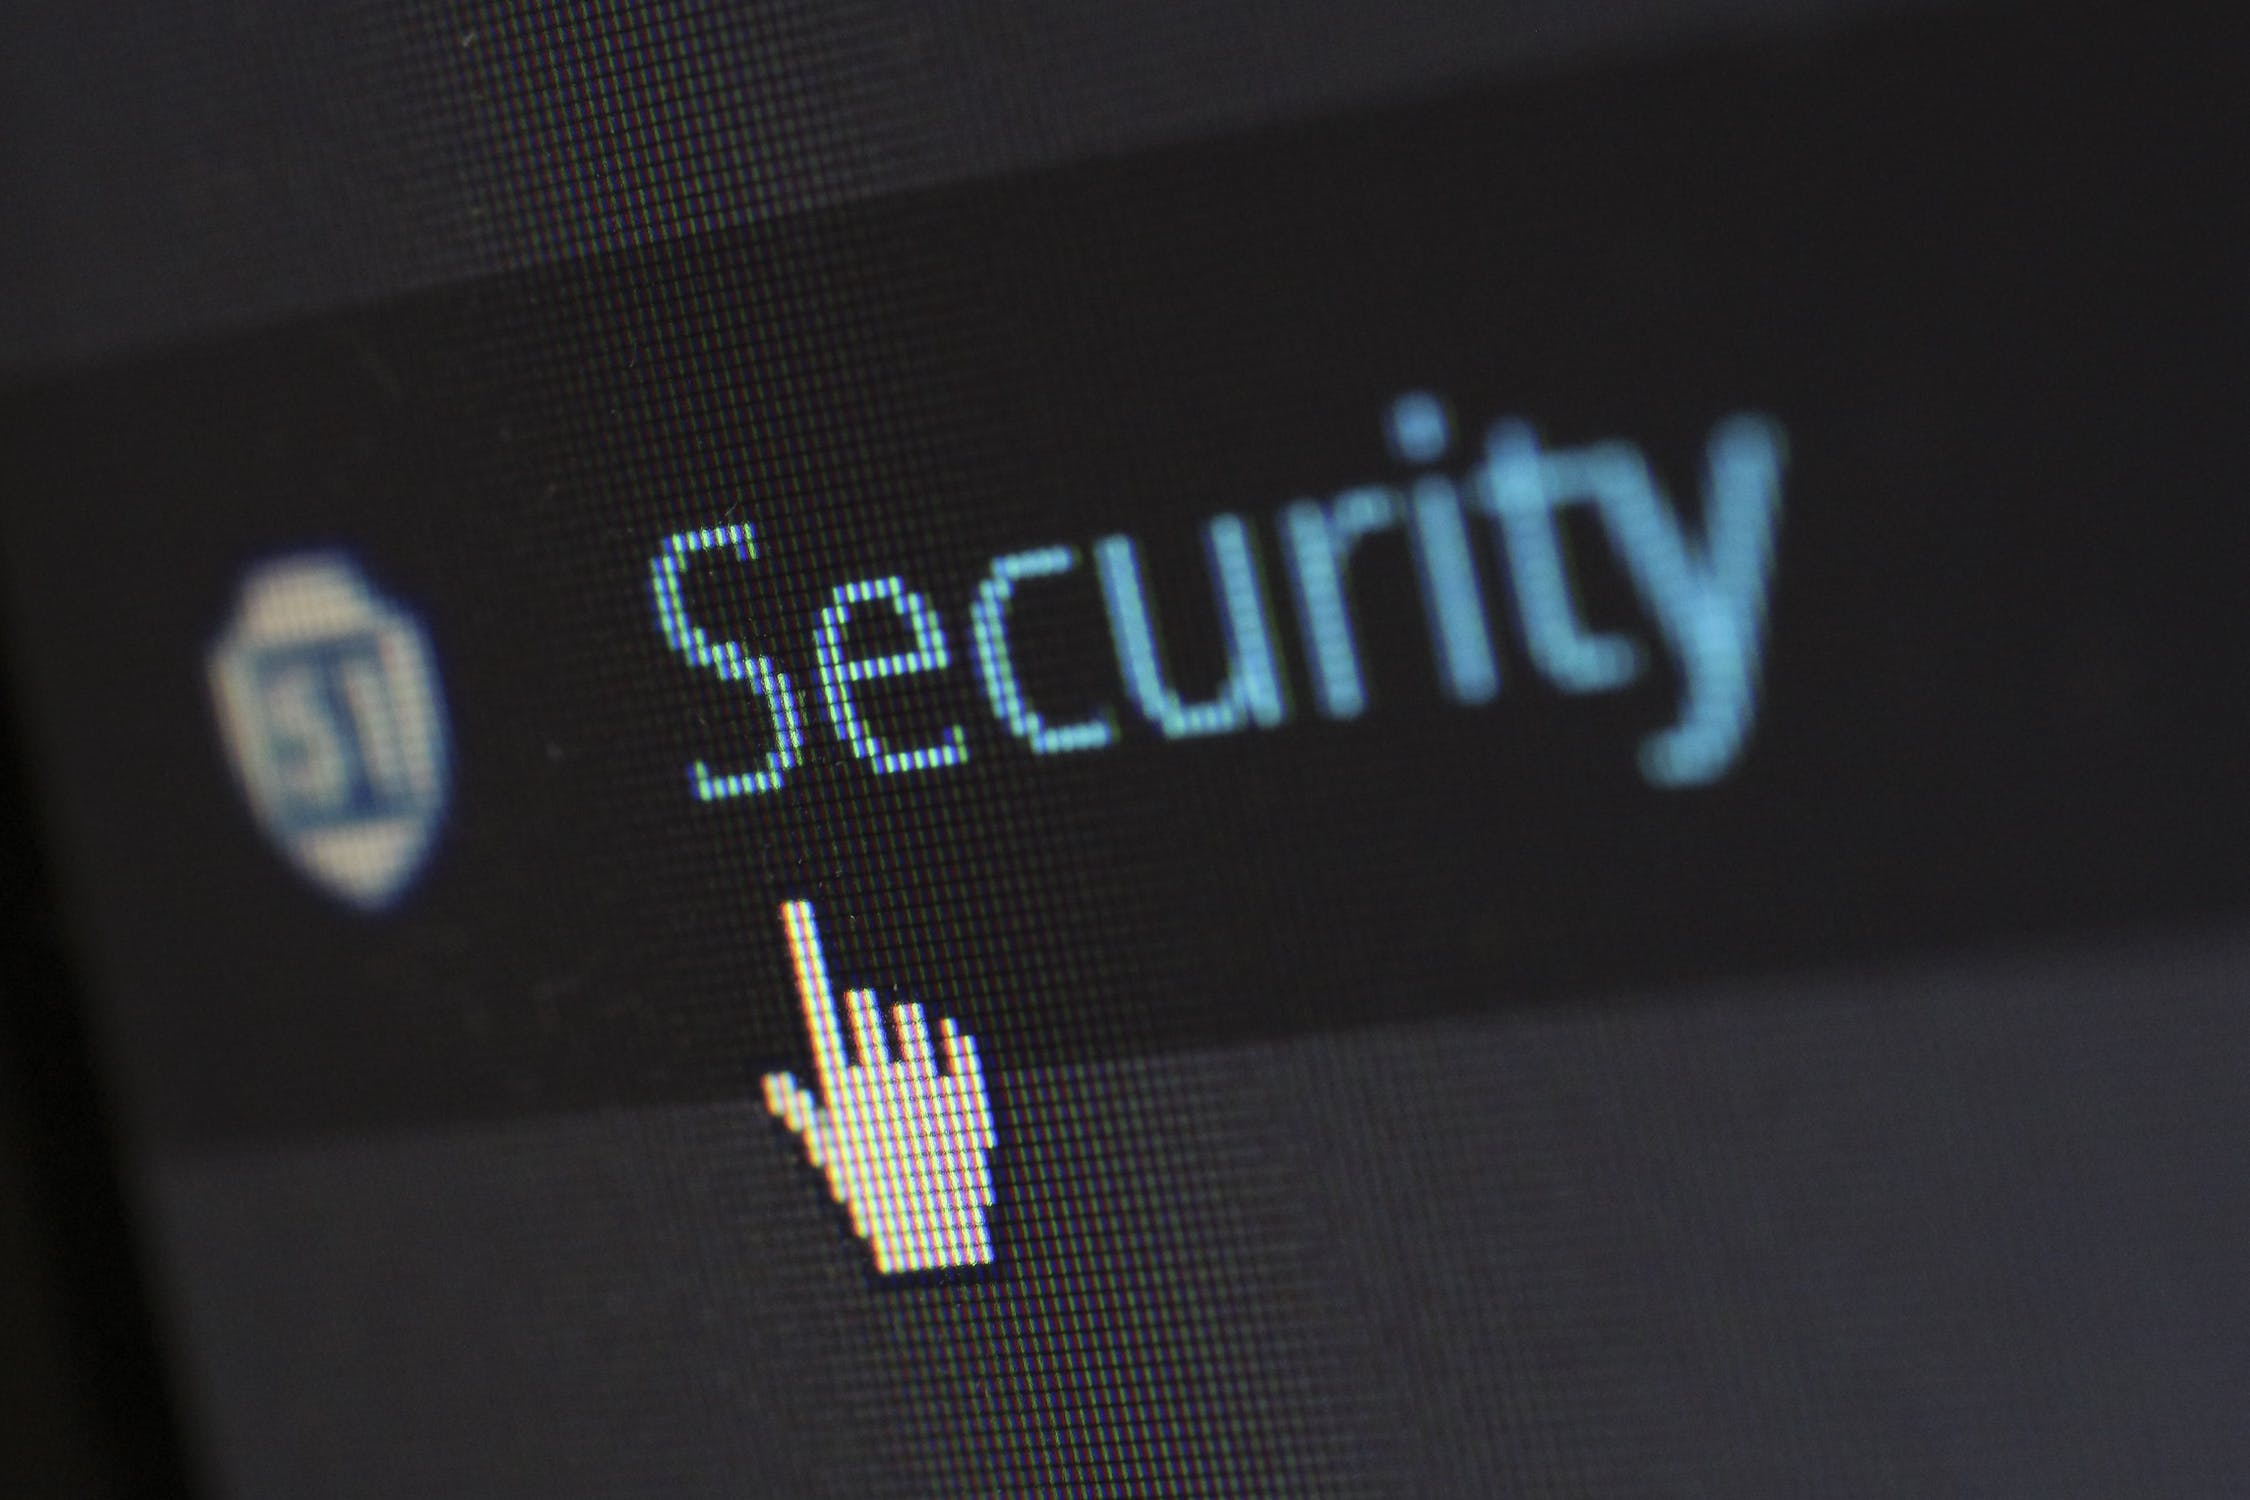 security access companies